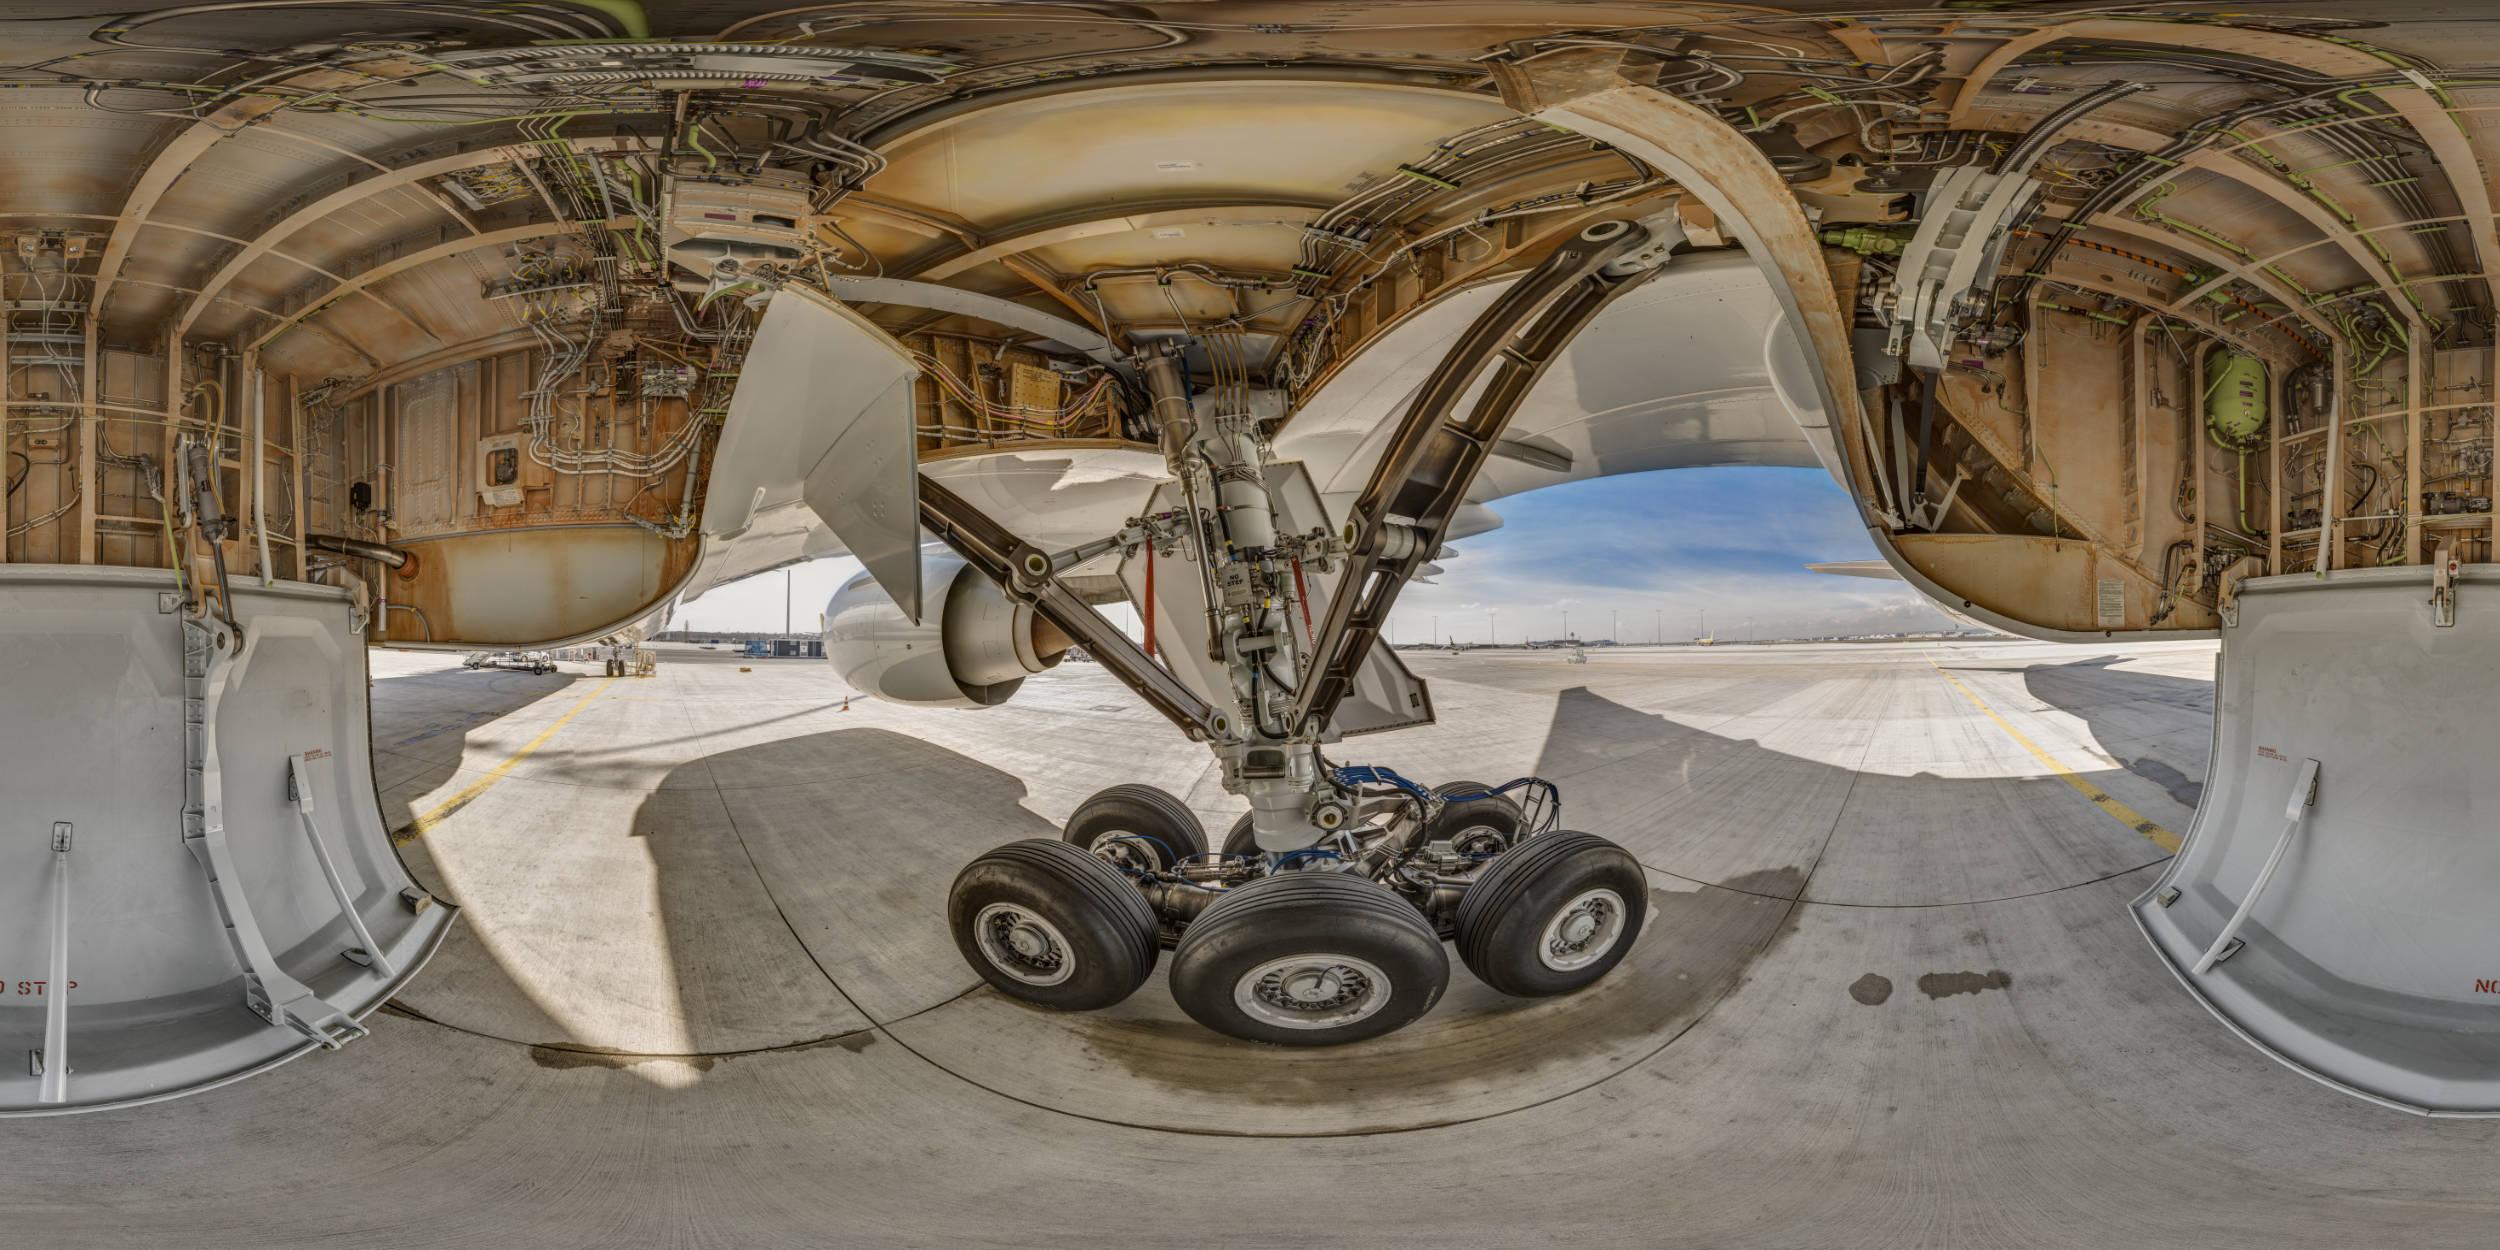 Panoramafotografie Virtuelle Touren 360Grad Fotografie Stuttgart und Umgebung Panorama 360°x180° Sphäre Flughafen Frankfurt Lufthansa Technik Boing 777 Landing Gear Fahrwerk